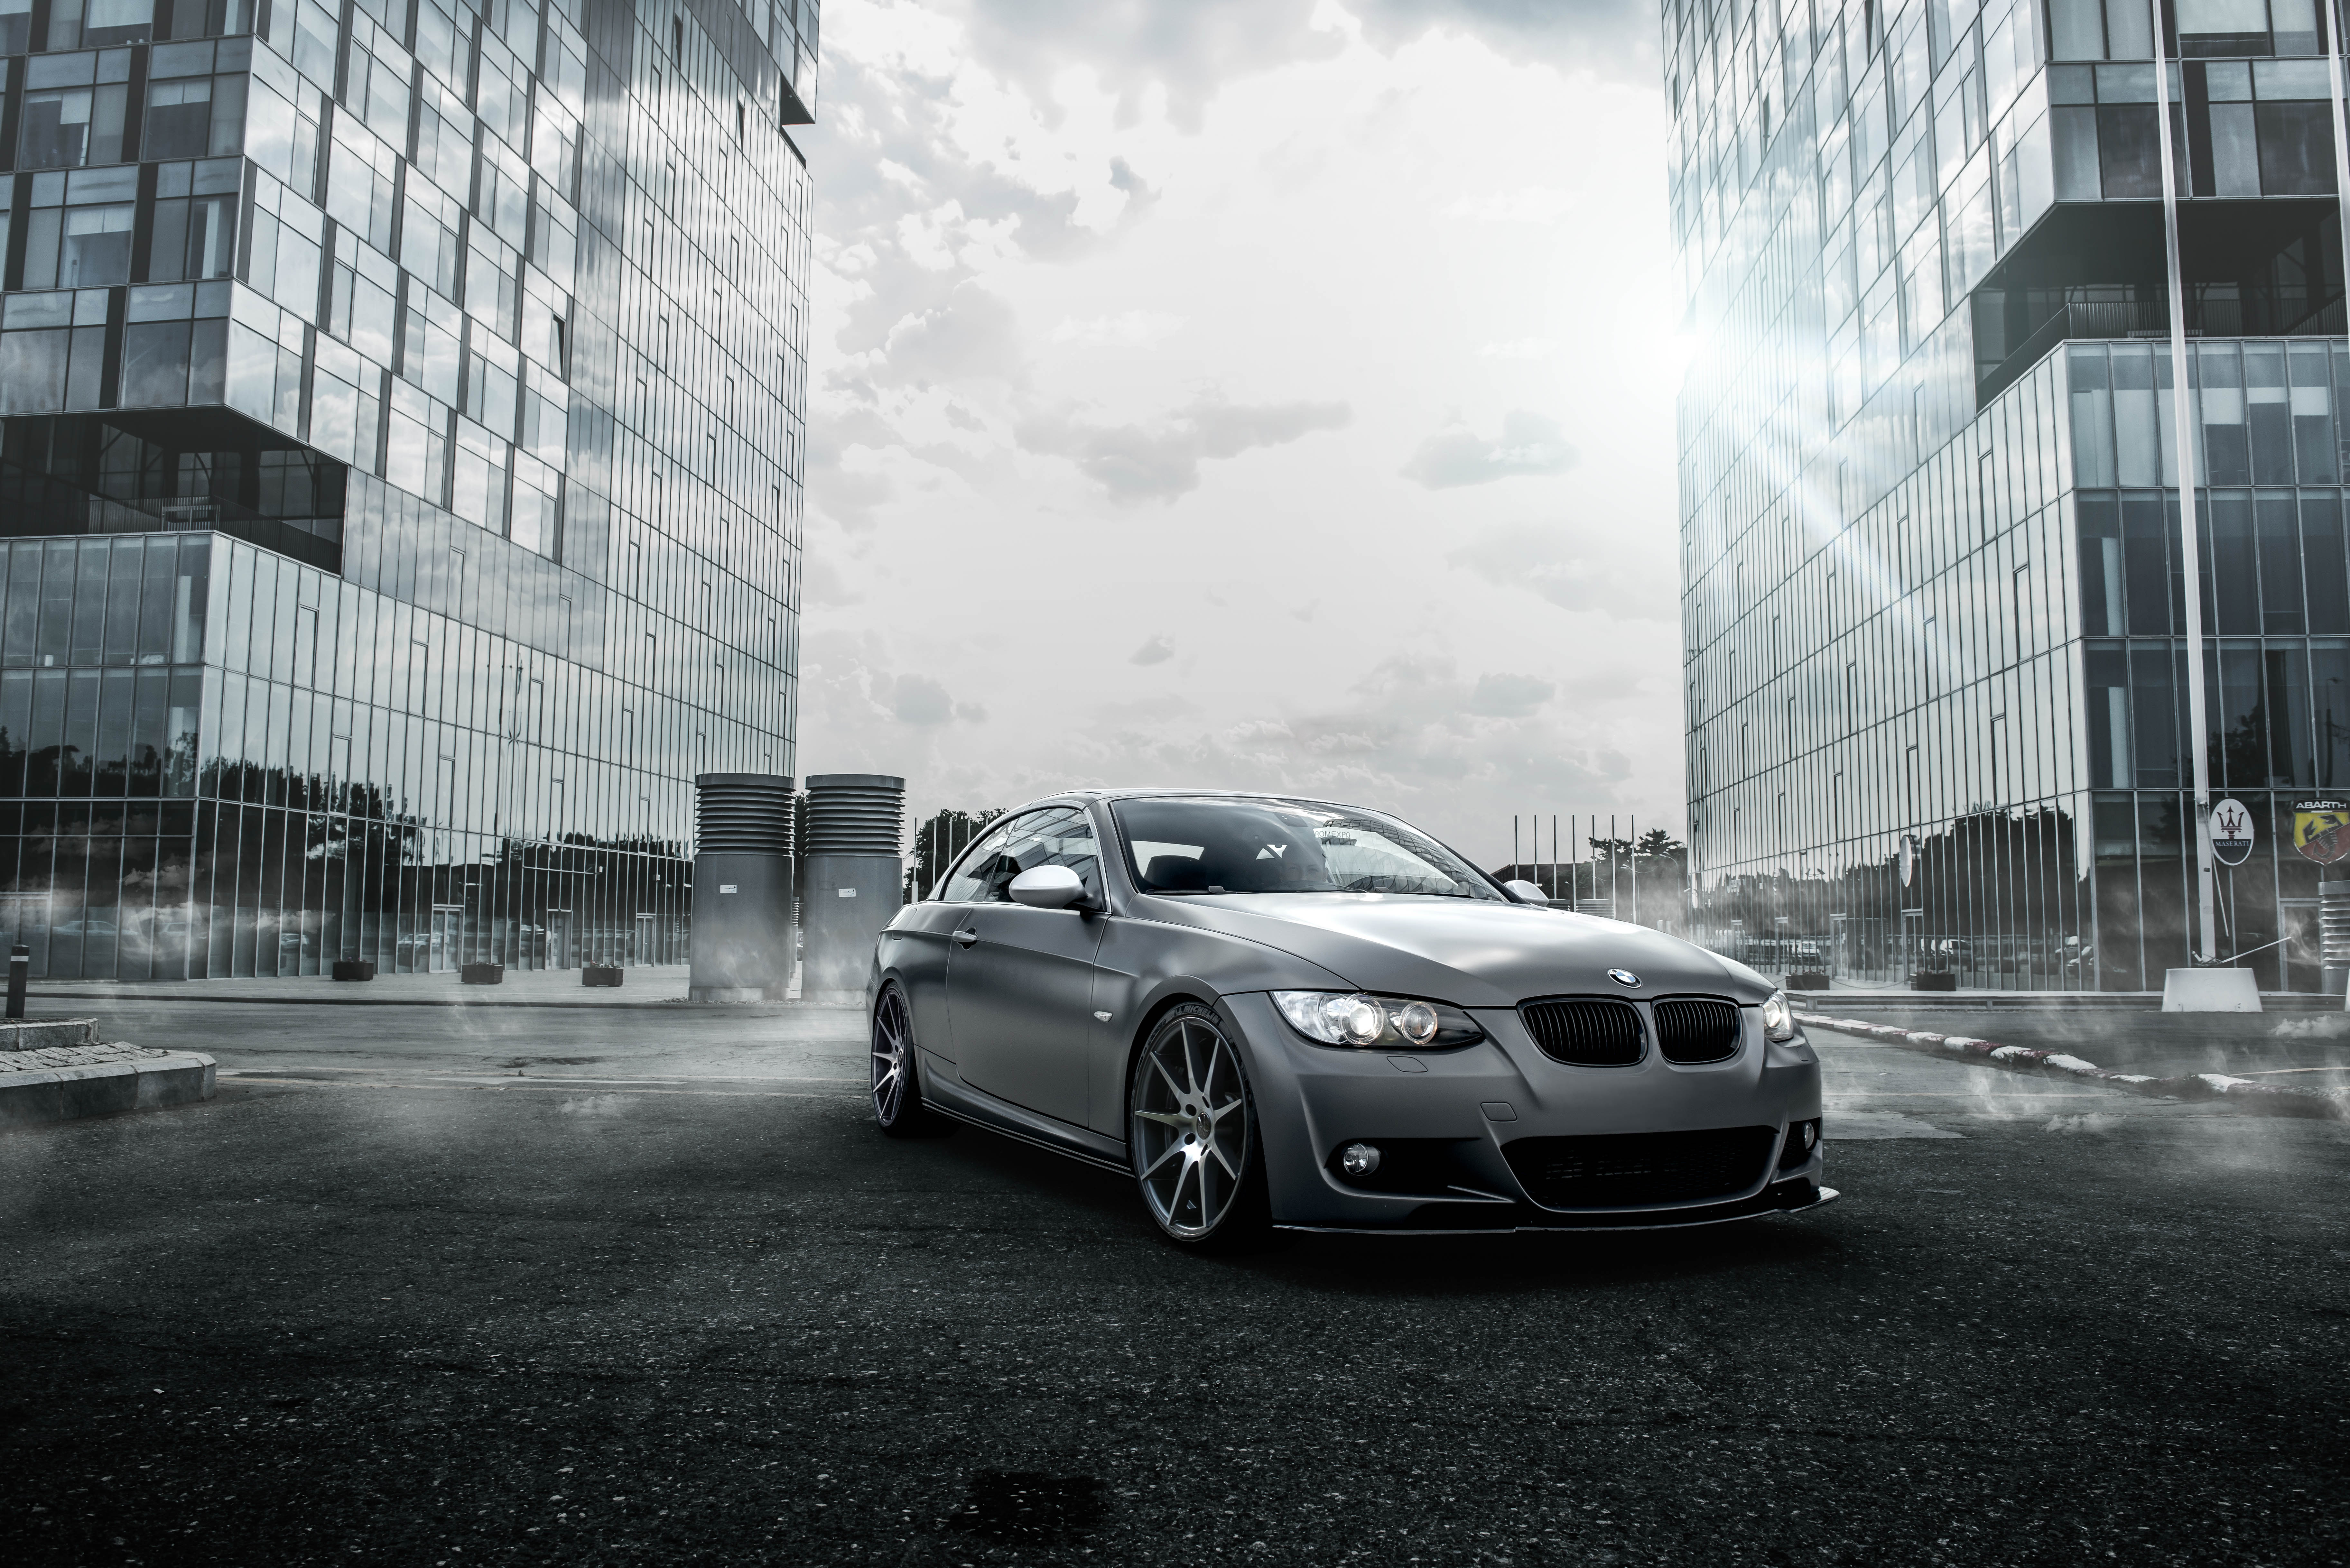 черно-бело фото BMW  № 2422813 загрузить